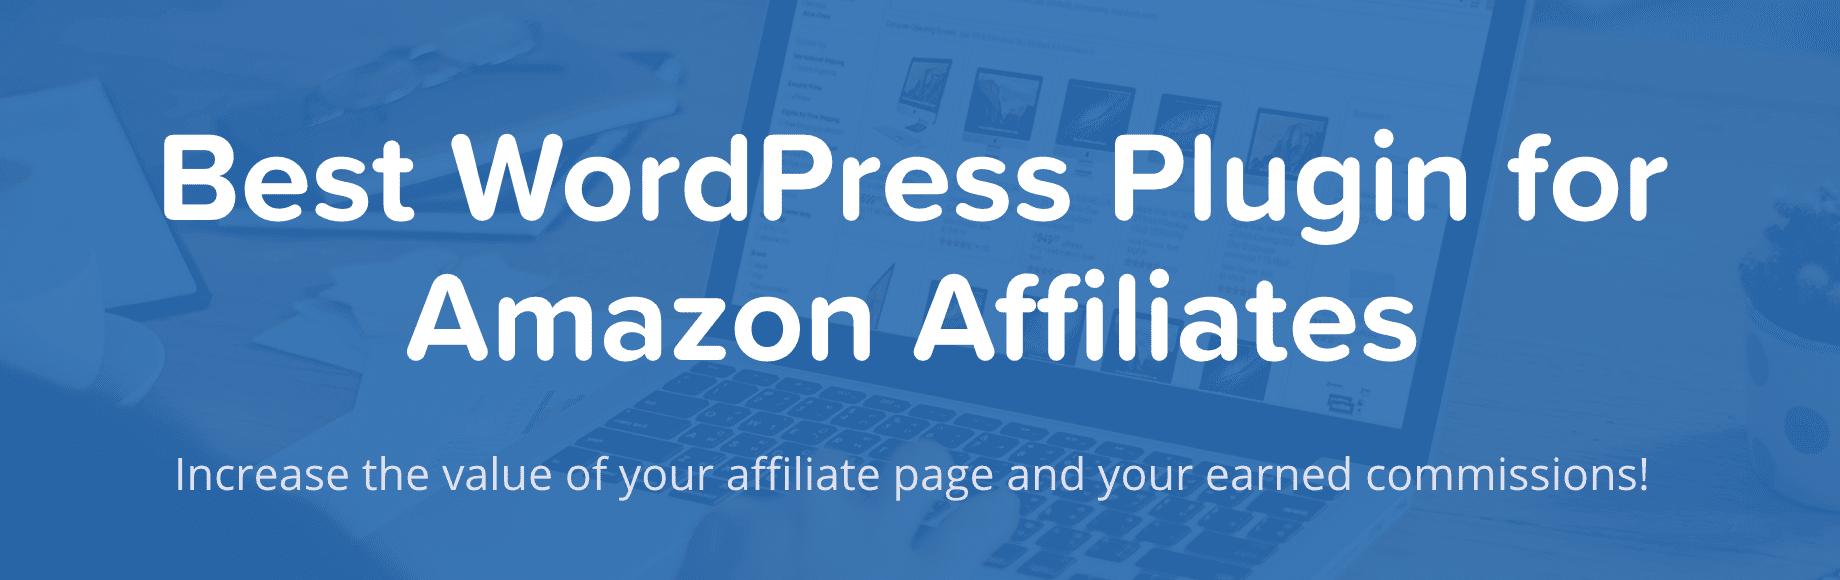 The Amazon Affiliate WordPress Plugin.